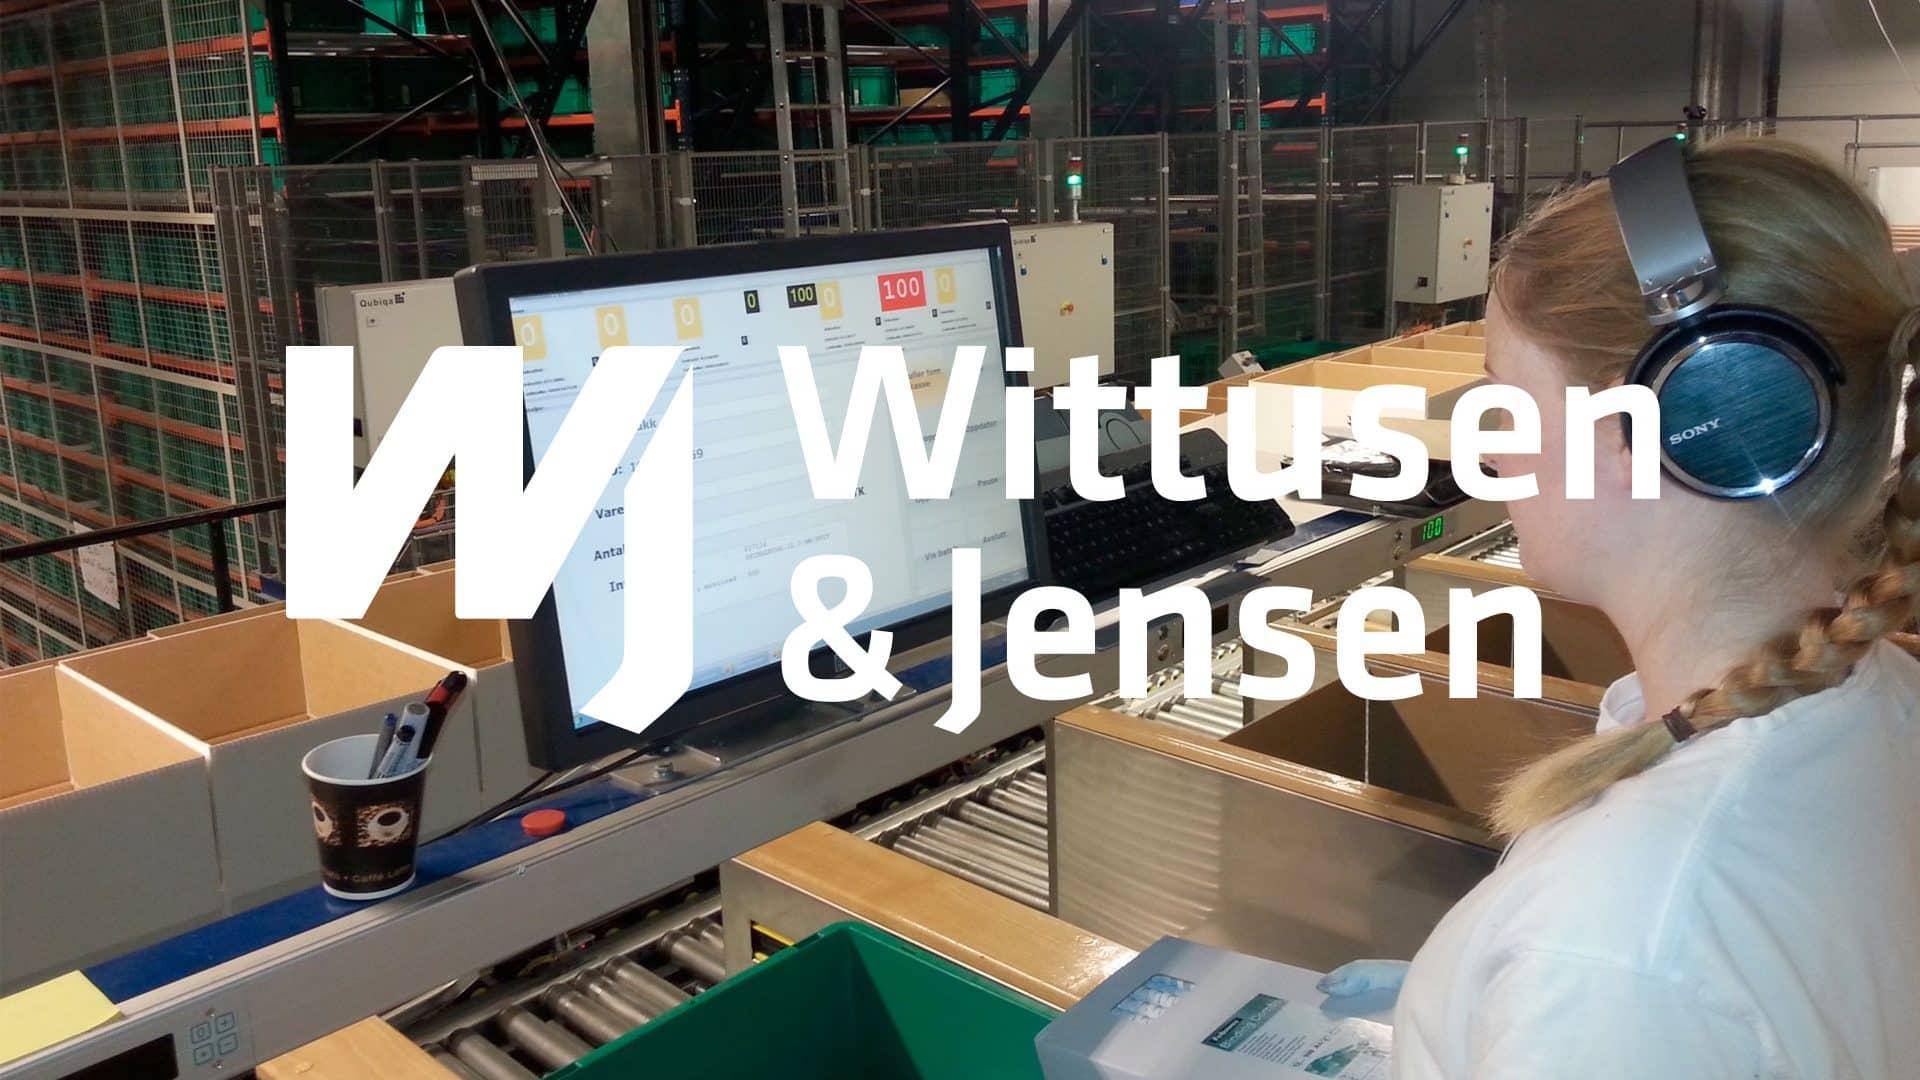 apportsystems_kundecase_wittusenjensen_1920x1100